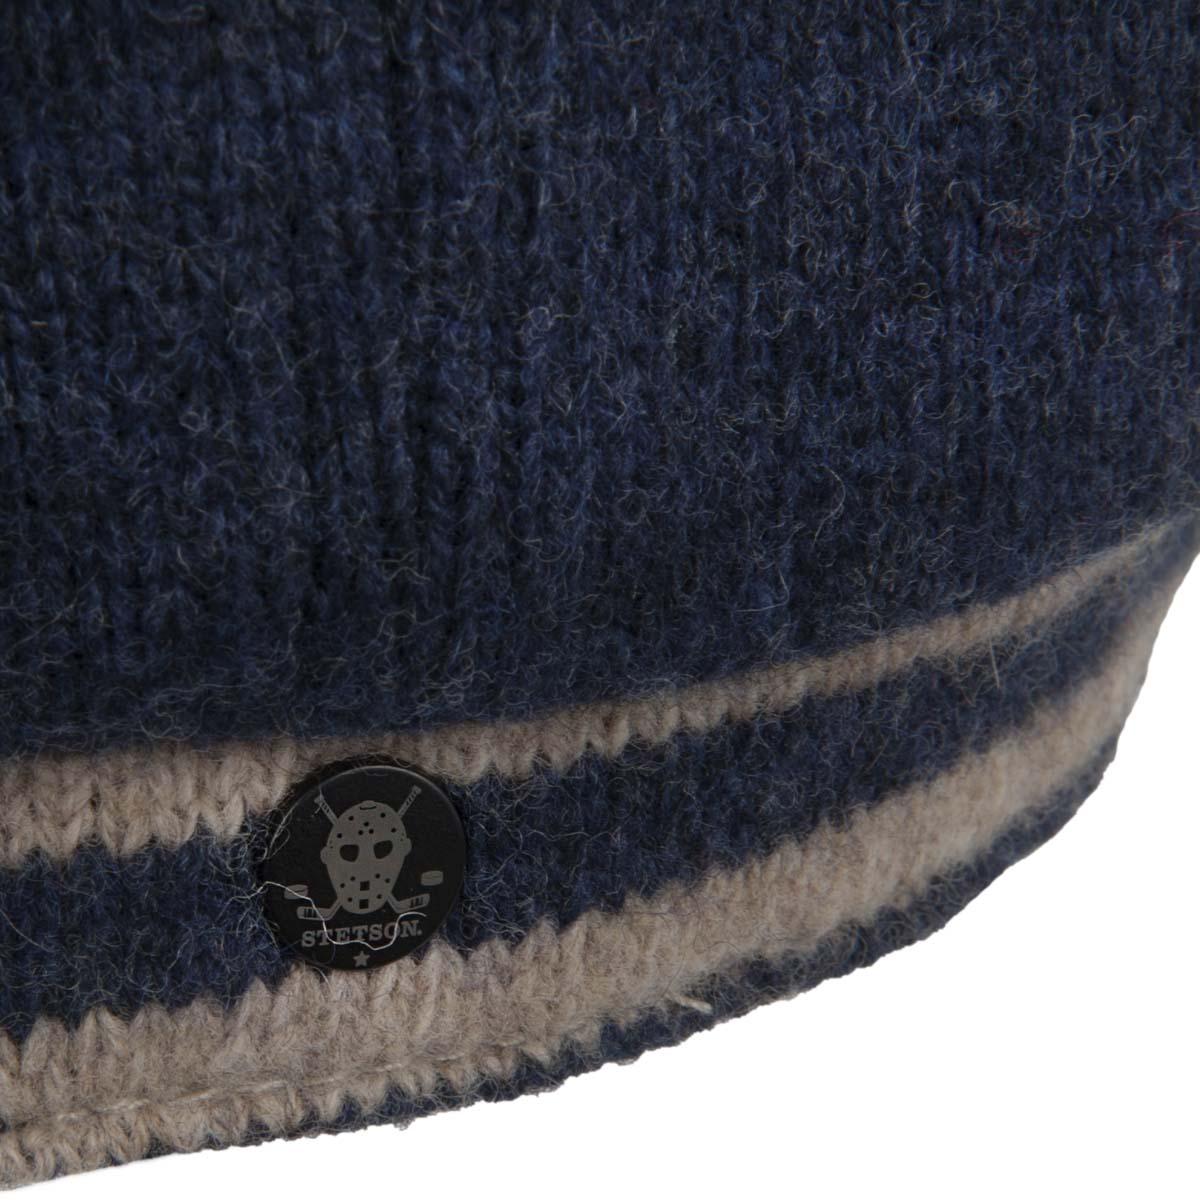 bac3f1d57 Hatteras wool sonder edition flat cap by STETSON